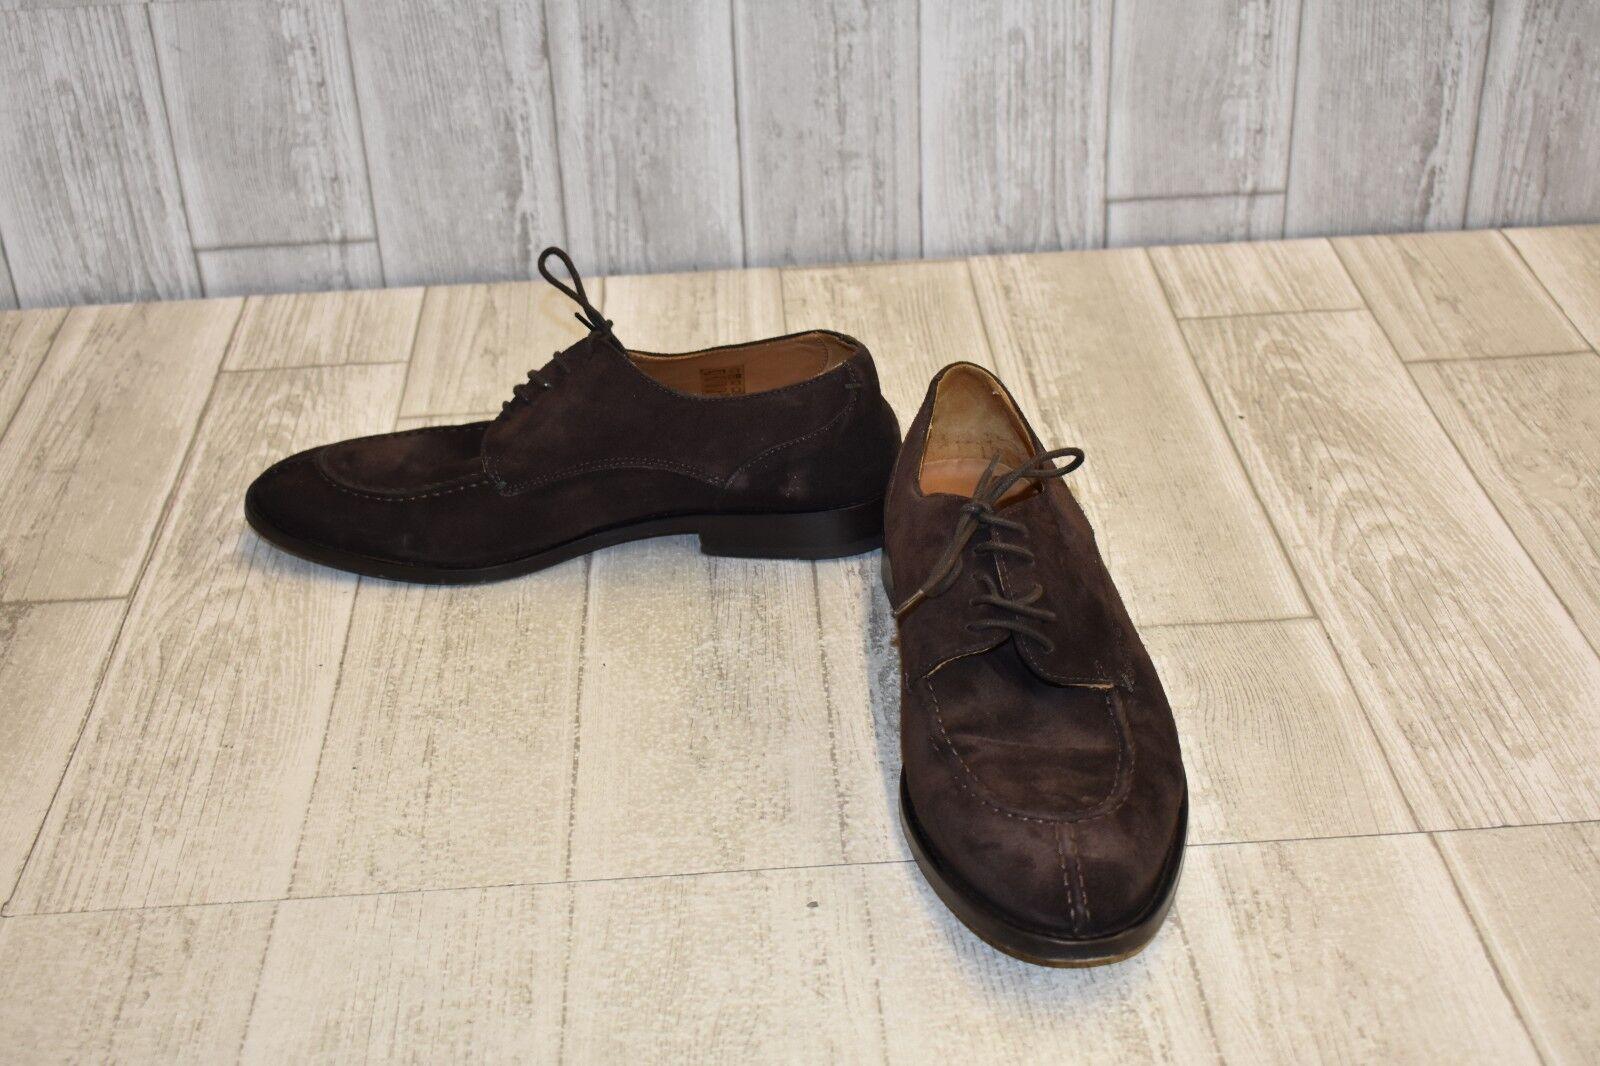 Sebago Collier Algonquin Oxford - Men's Size 9.5D, Dark Brown